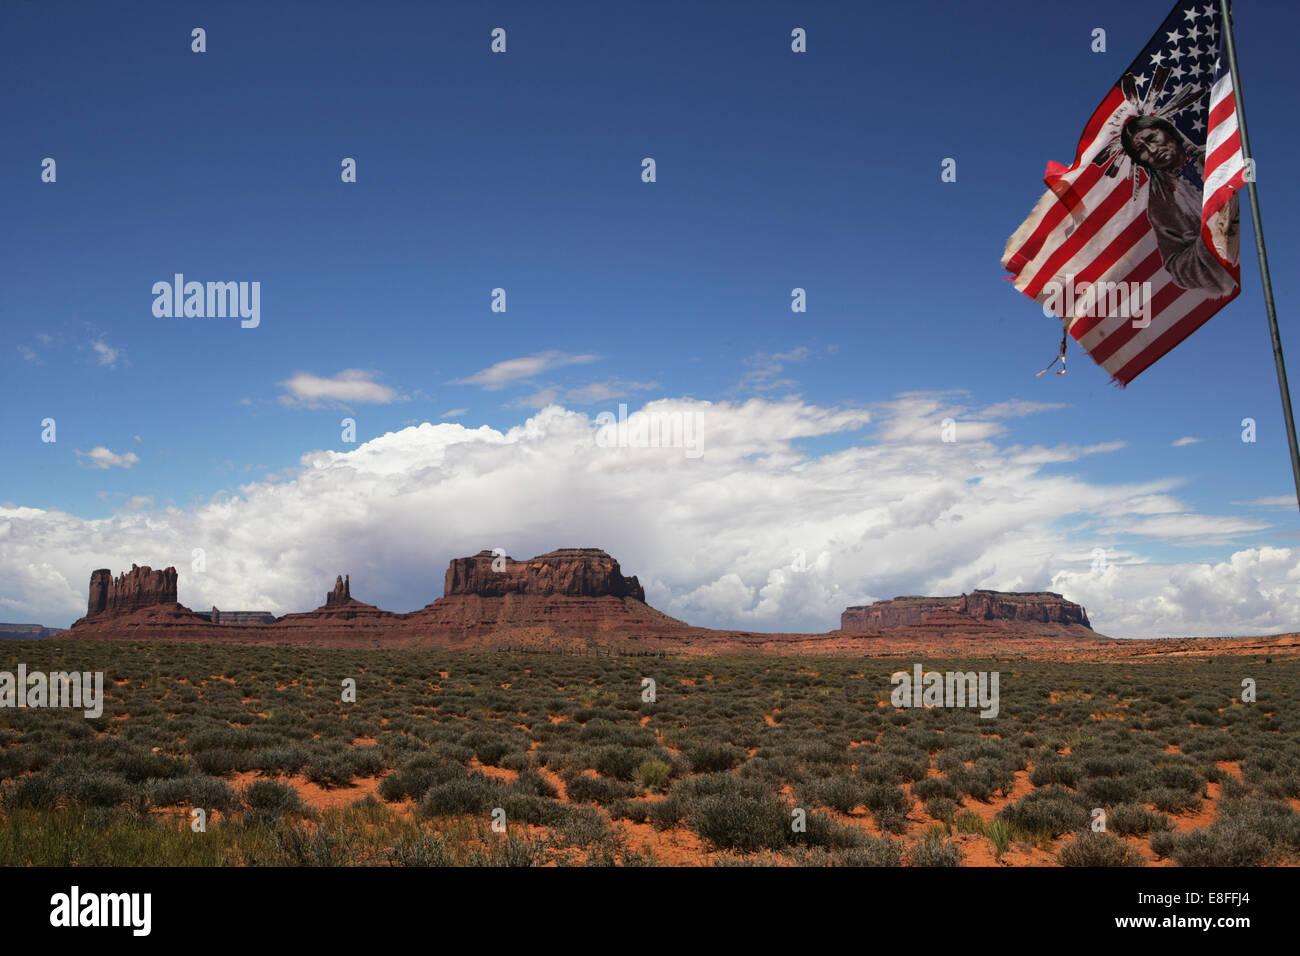 USA, Arizona, Monument Valley Navajo Tribal Park - Stock Image